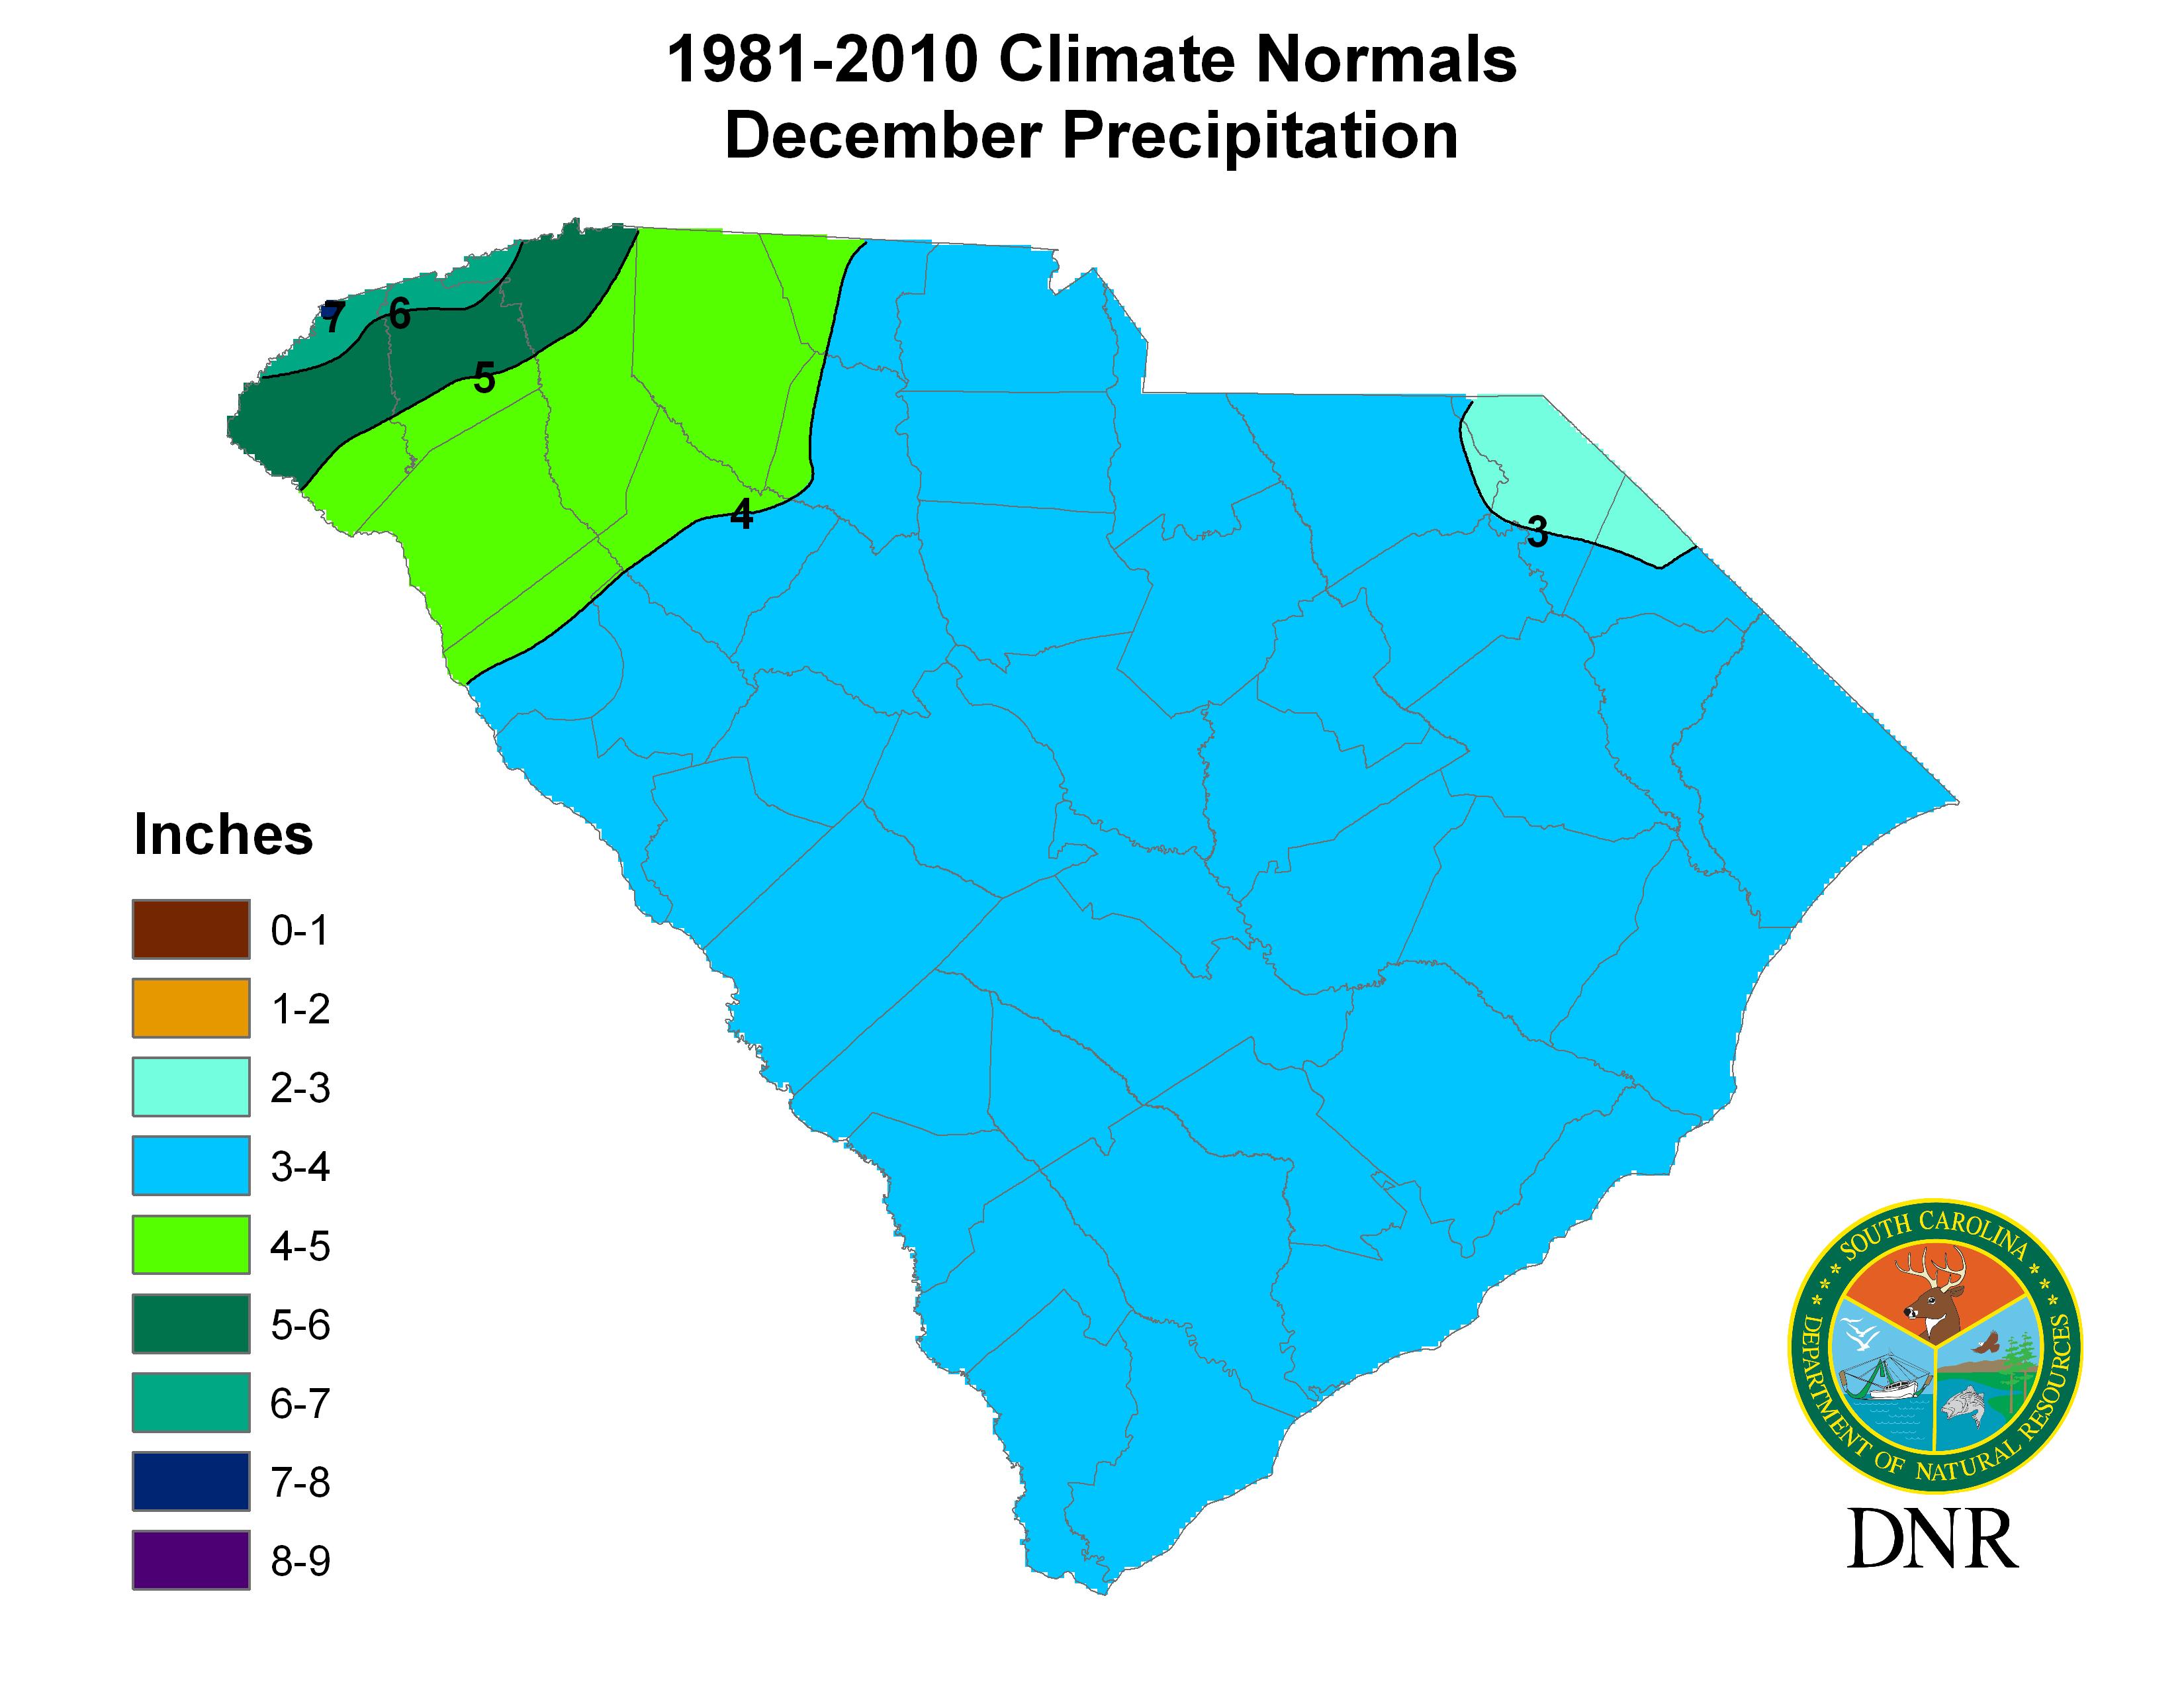 South Carolina State Climatology Office